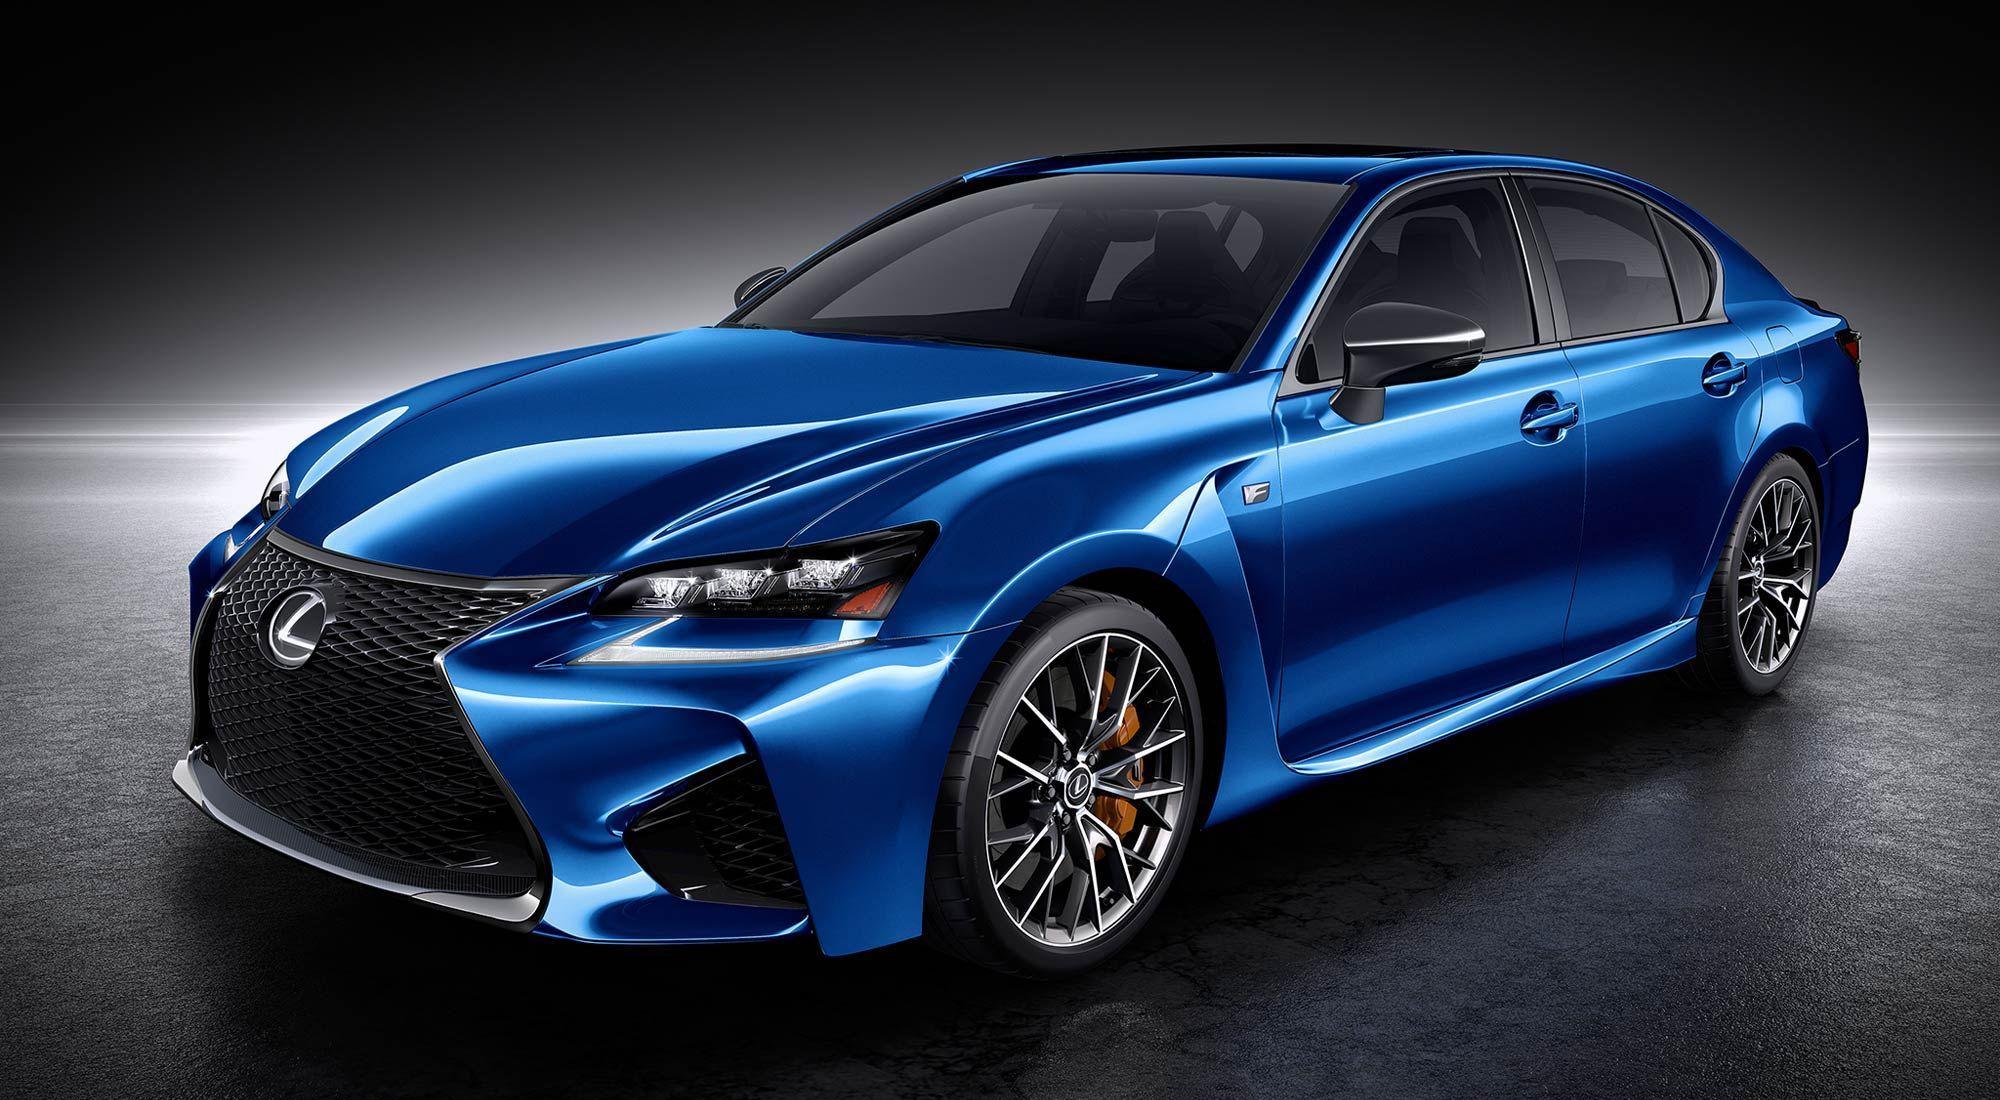 2020 Lexus Gs F Luxury Sedan With Images Lexus Cars Sports Sedan Lexus